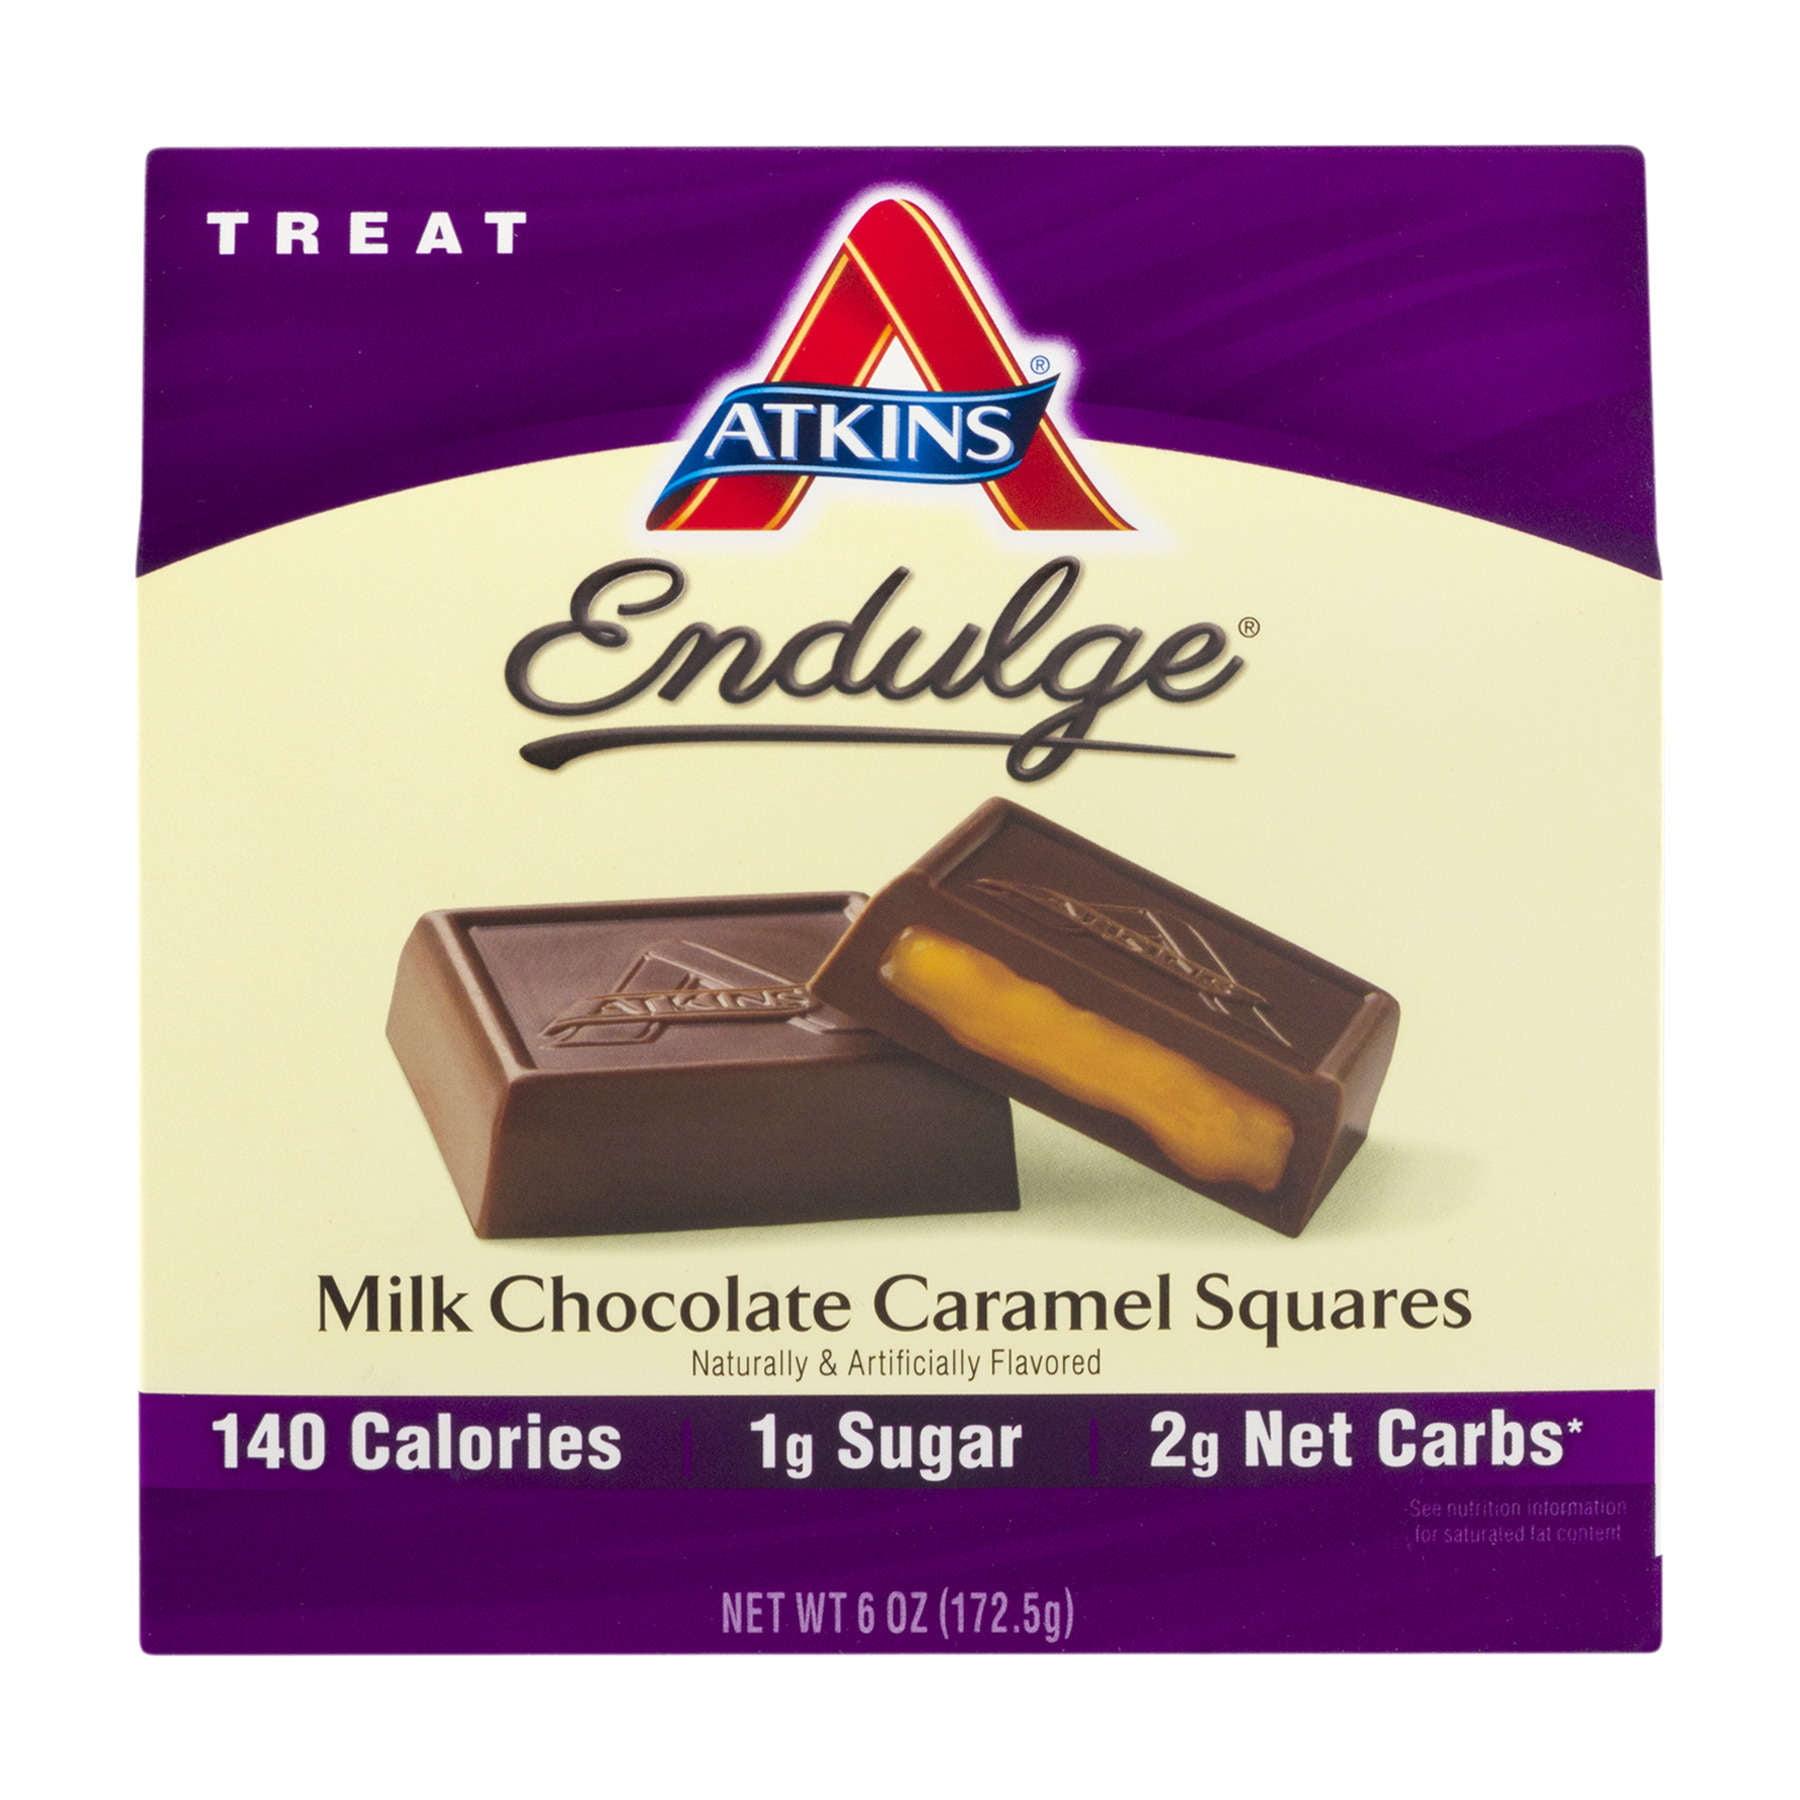 Atkins Endulge Milk Chocolate Caramel Squares, 5-pack (Treat)